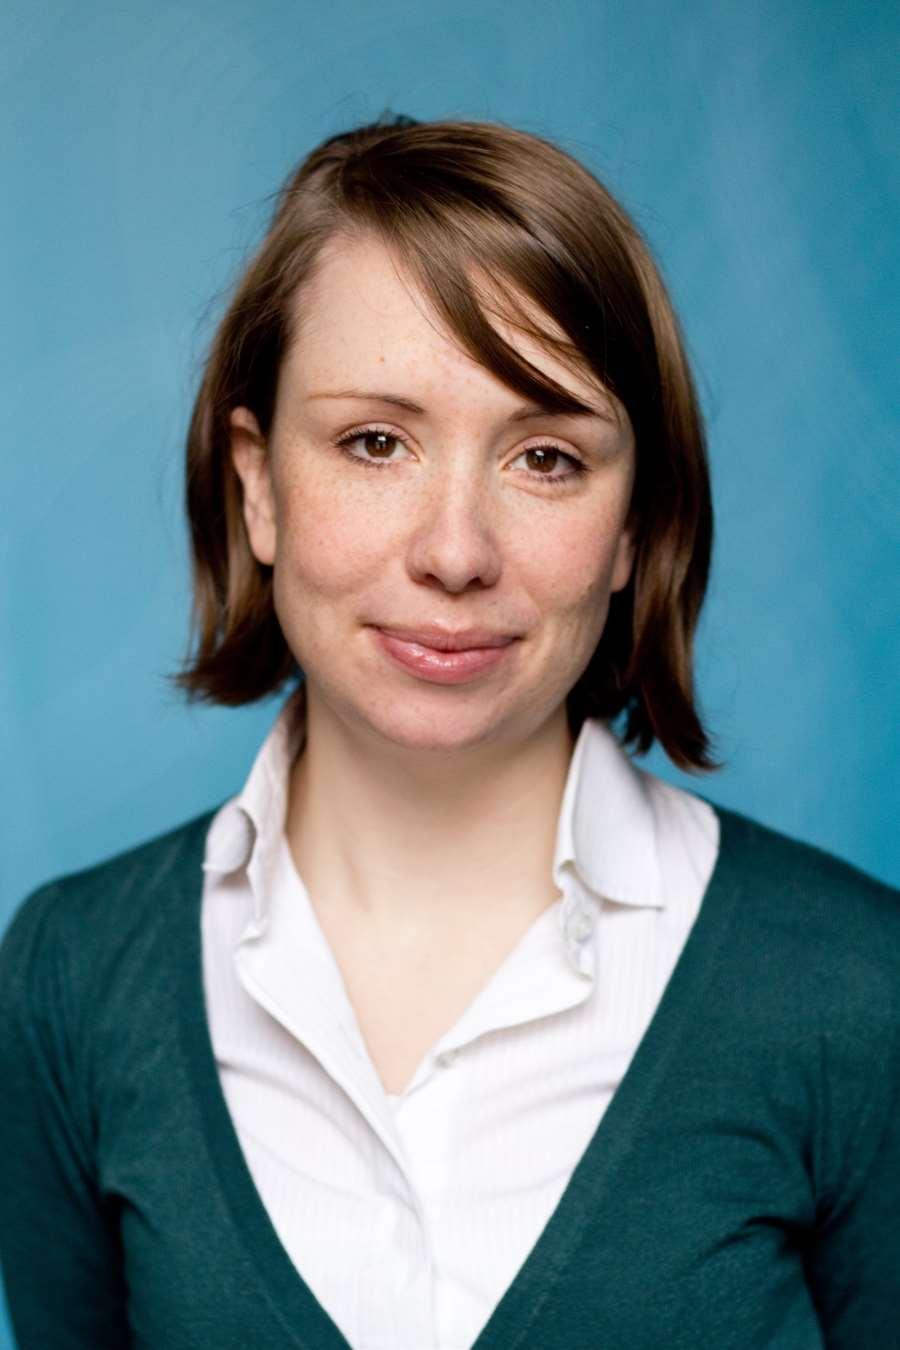 Maria Gabrielsen Jumbert takes over as new NCHS Director